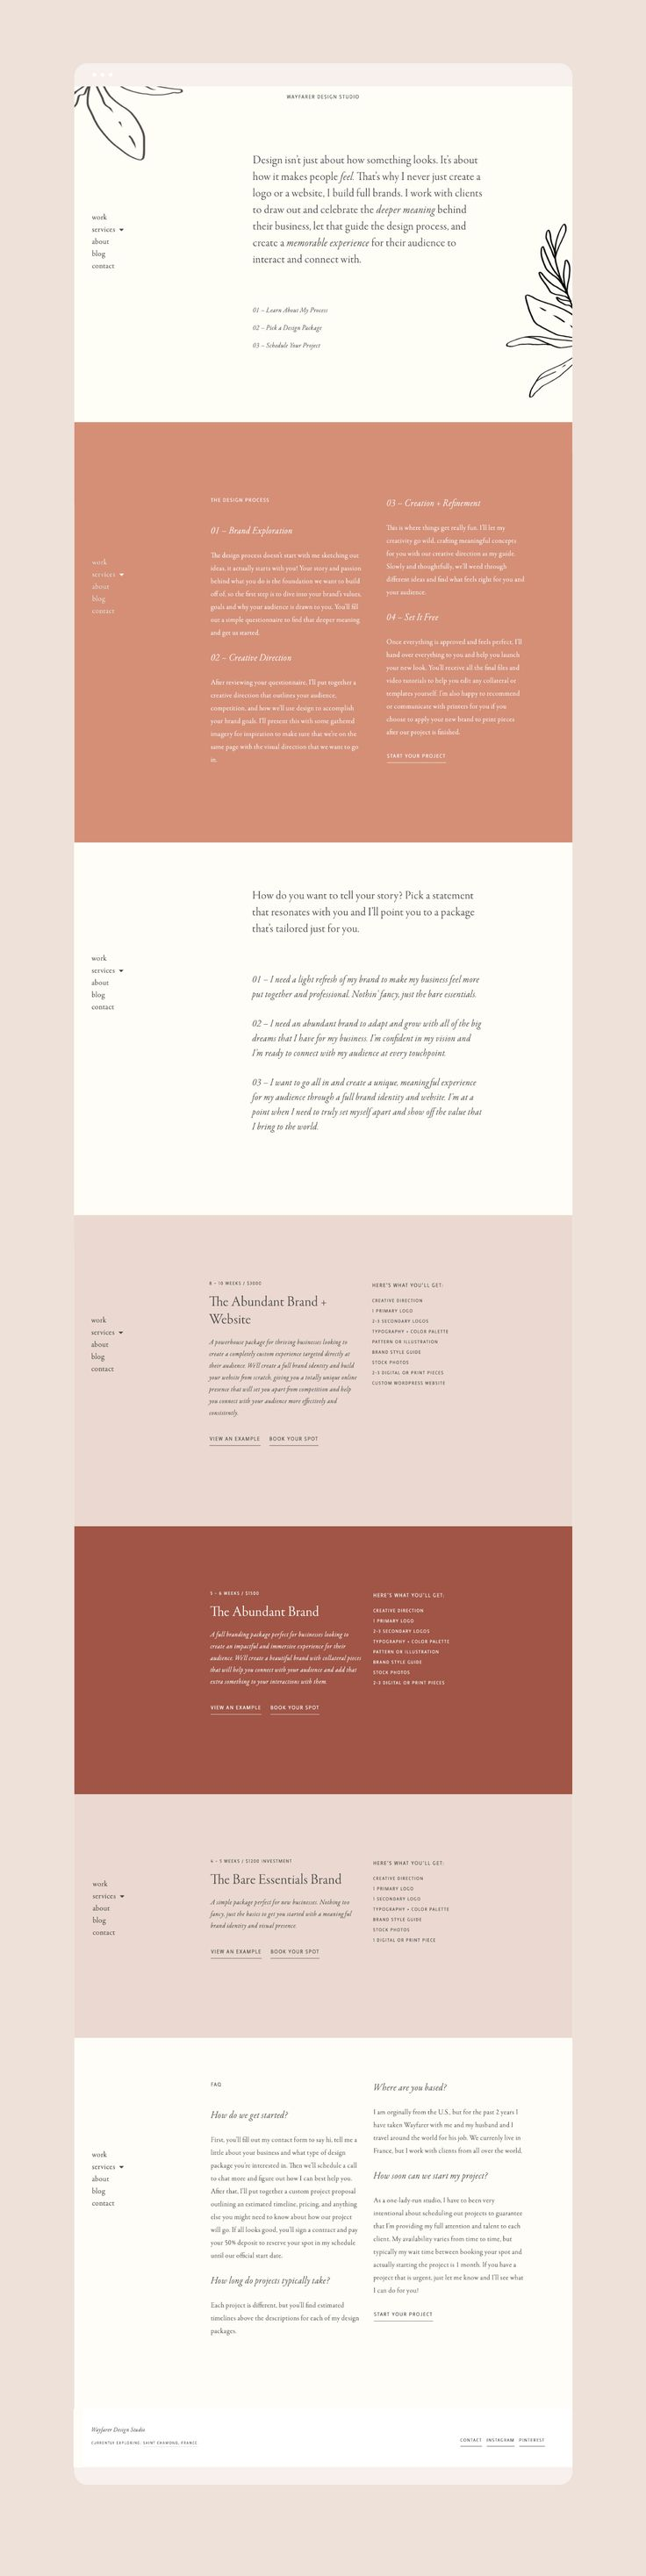 Web design by Wayfarer Design Studio // design, branding, brand, brand identity, logo, logos, graphic design, identity, web, website, website design, blogger, blog design, lettering, hand lettering, blogging, illustration, services page